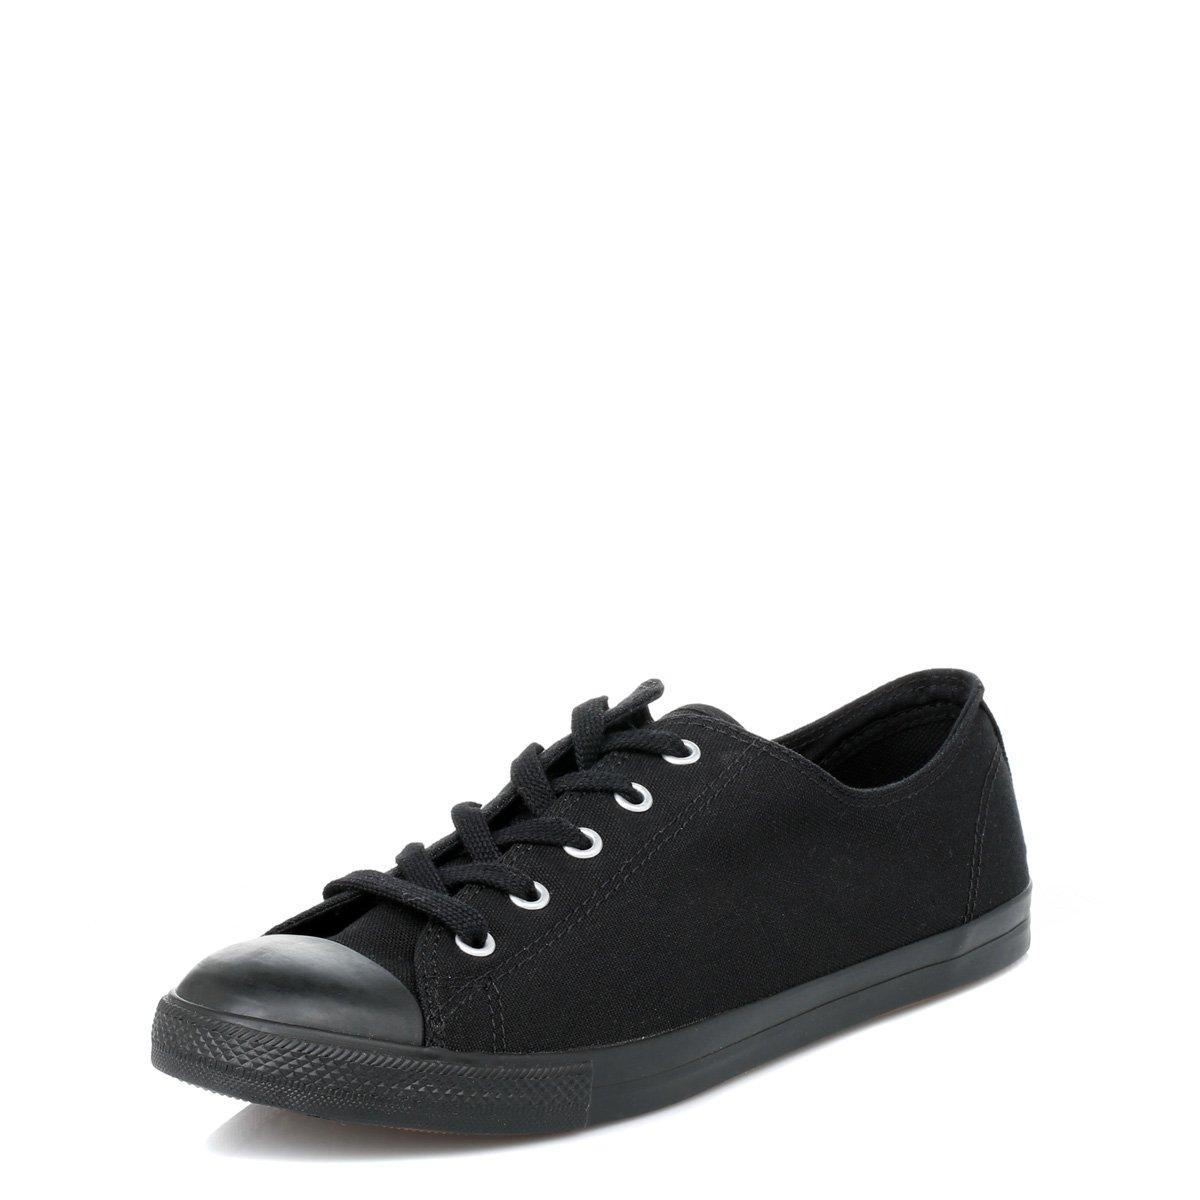 Converse As Dainty Femme Core Cvs Ox 202280 Damen Sneaker  38 EU|Black with Black Soles